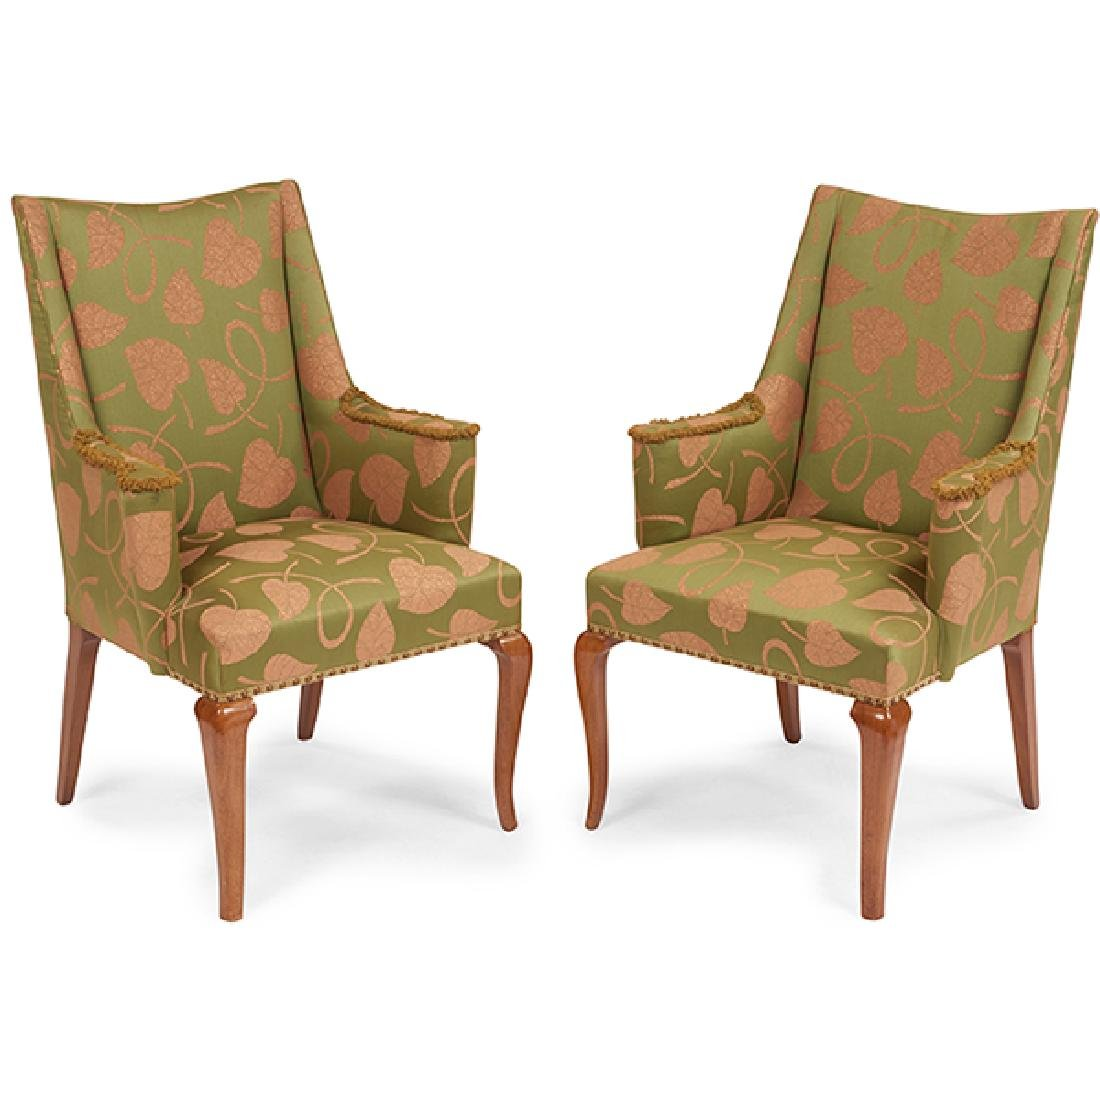 Edward Wormley (1907-1995) for Dunbar chairs, pair,